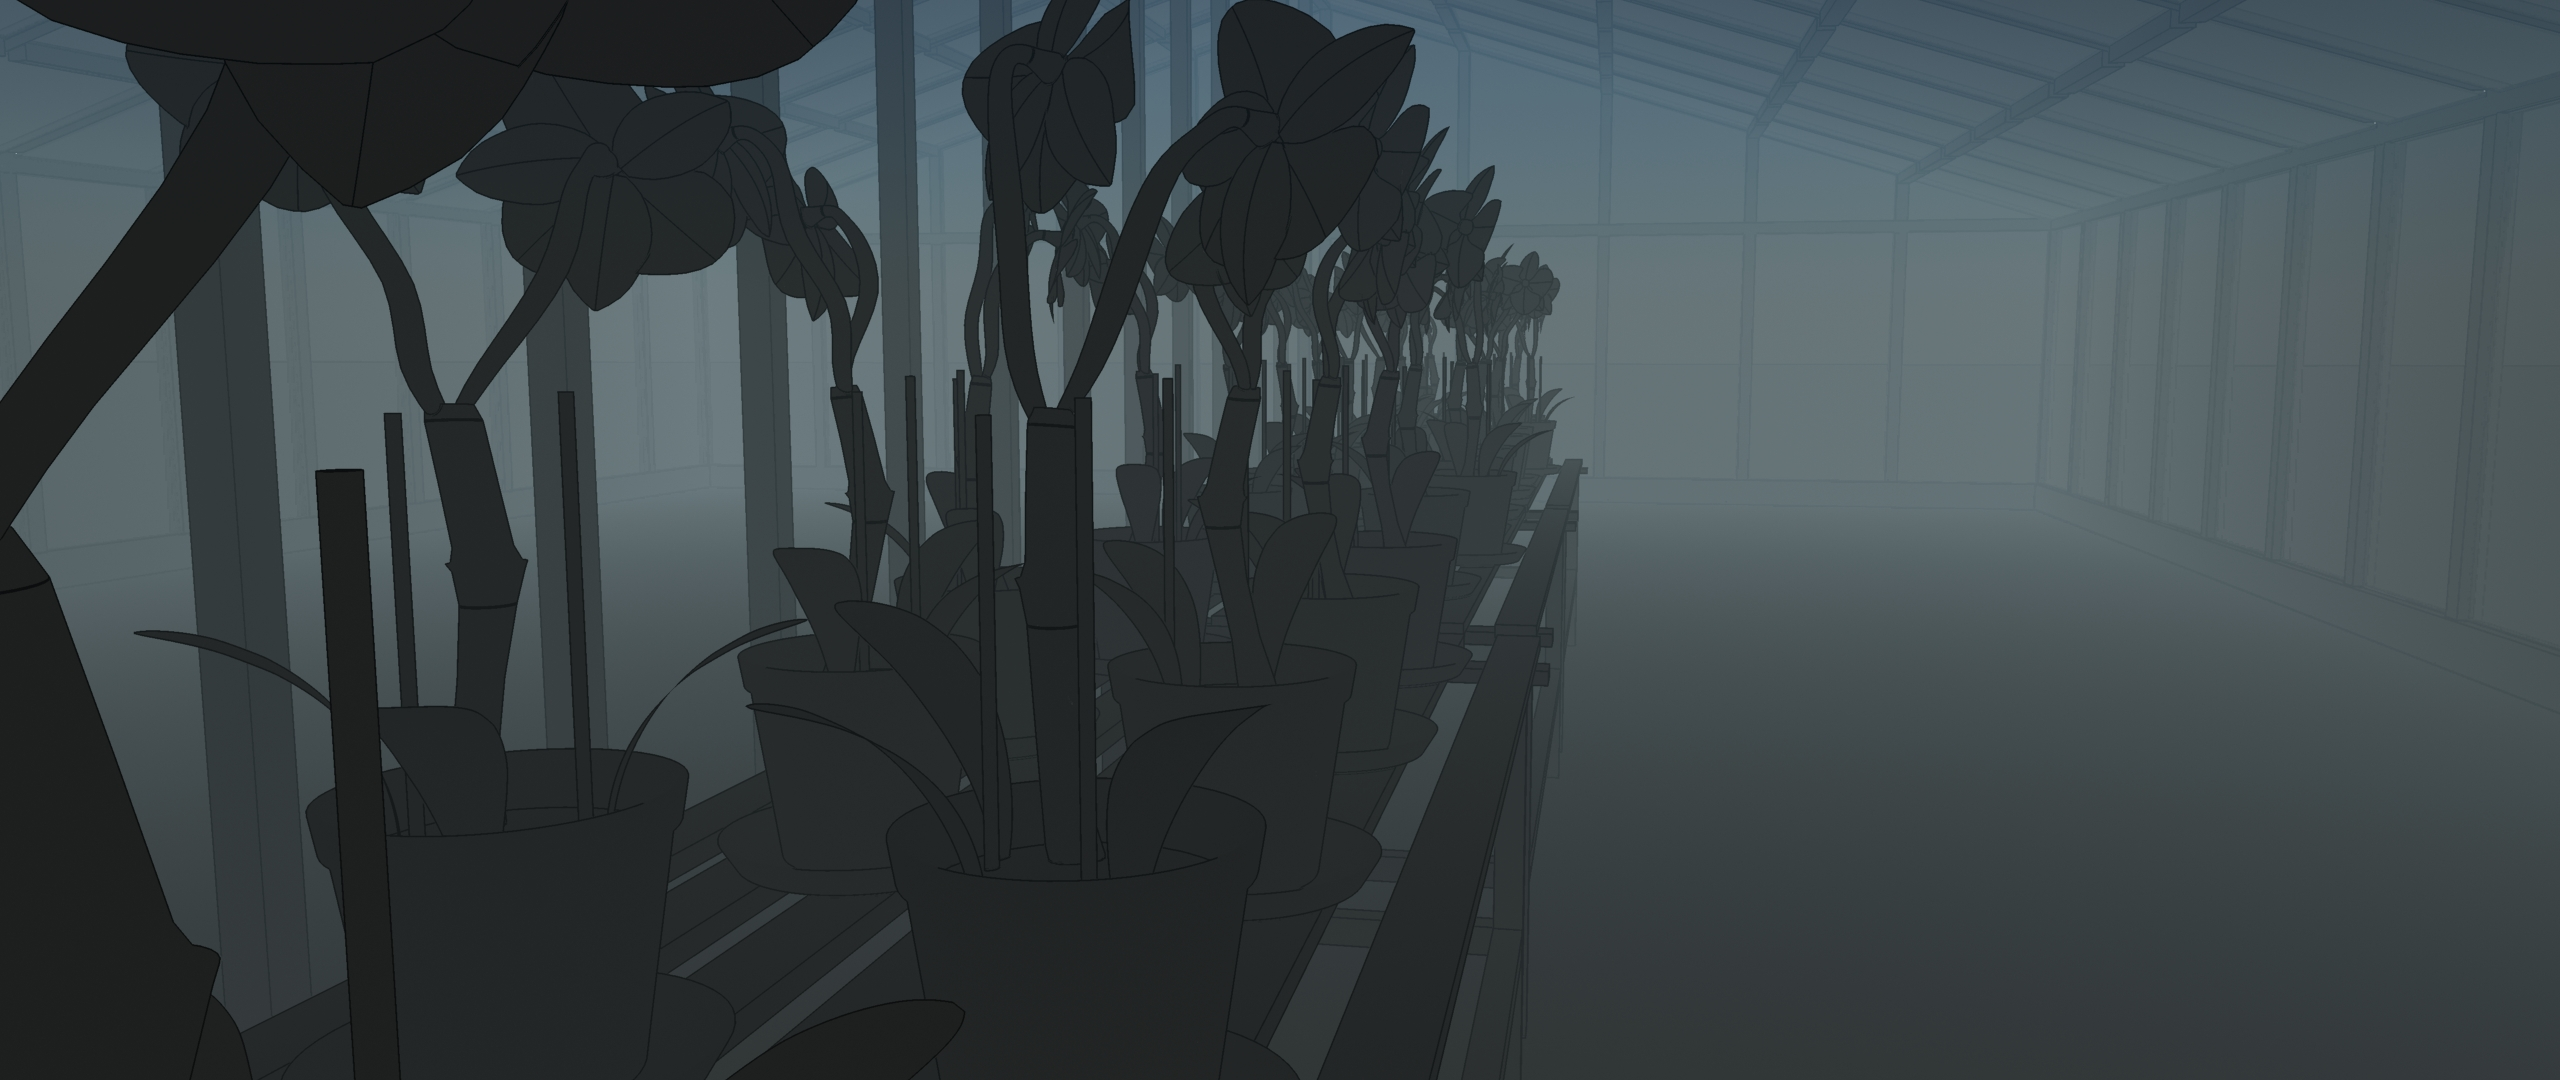 Greenhouse Darkmood 1 by felixj3130